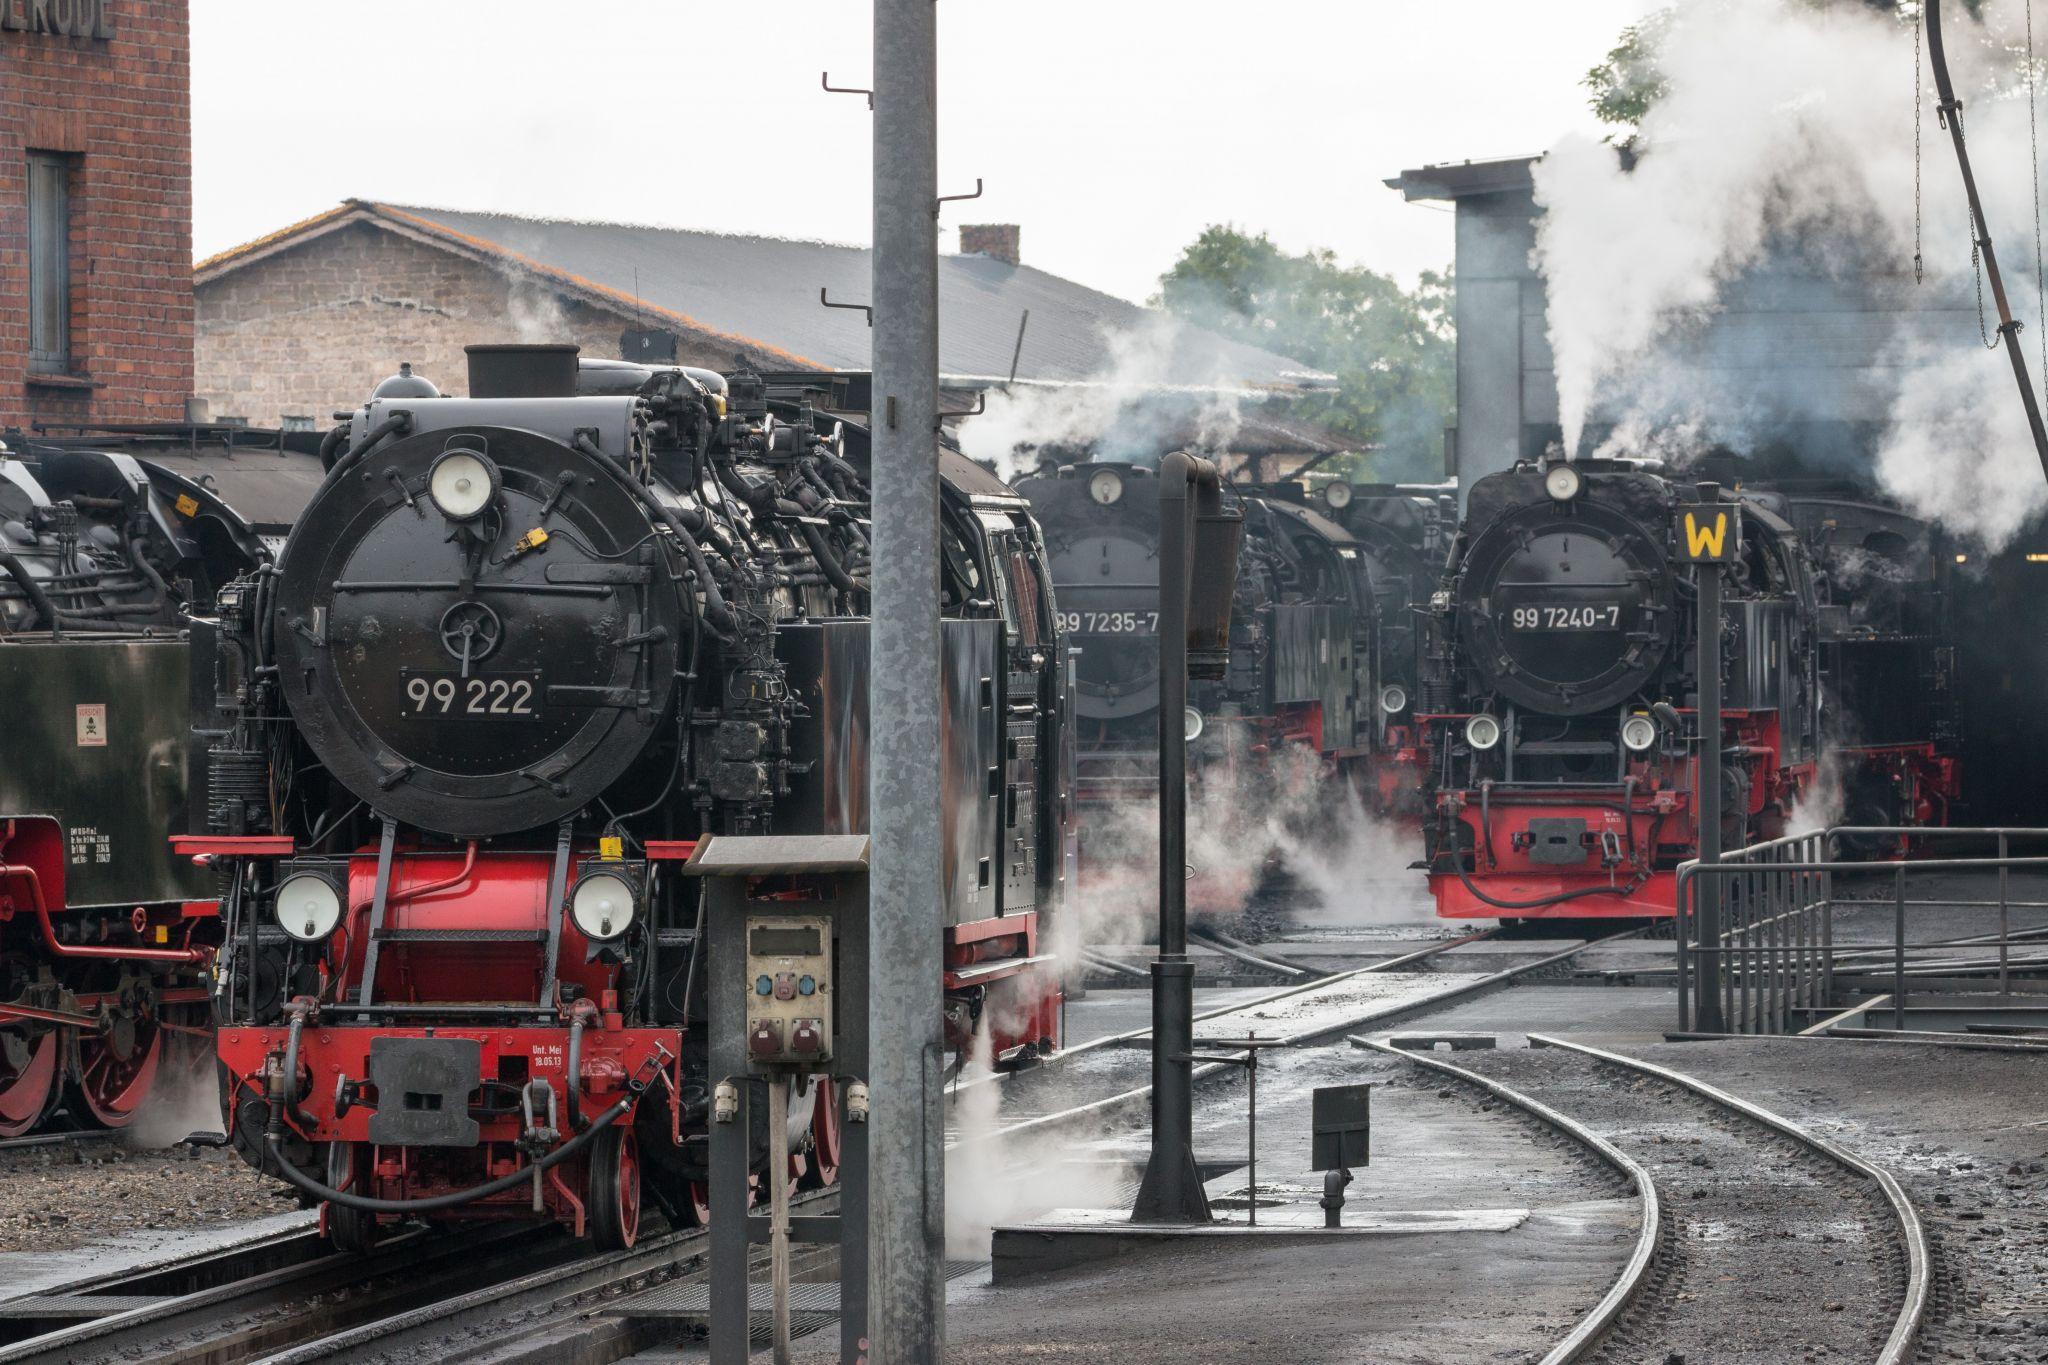 Depot of the Harzer Schmalspurbahnen, Wernigerode, Harz, Germany